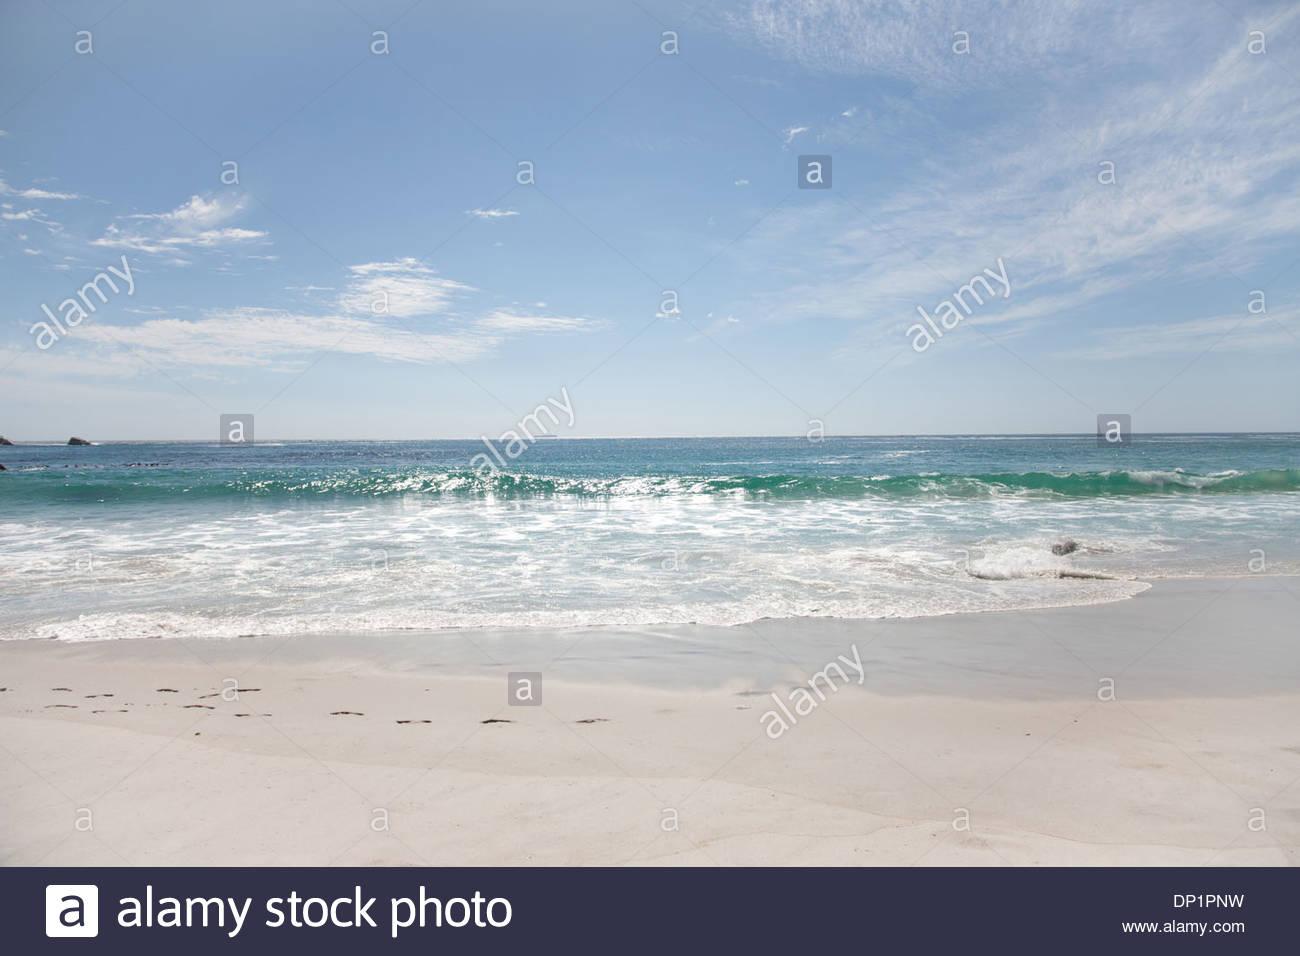 Surf along beach - Stock Image